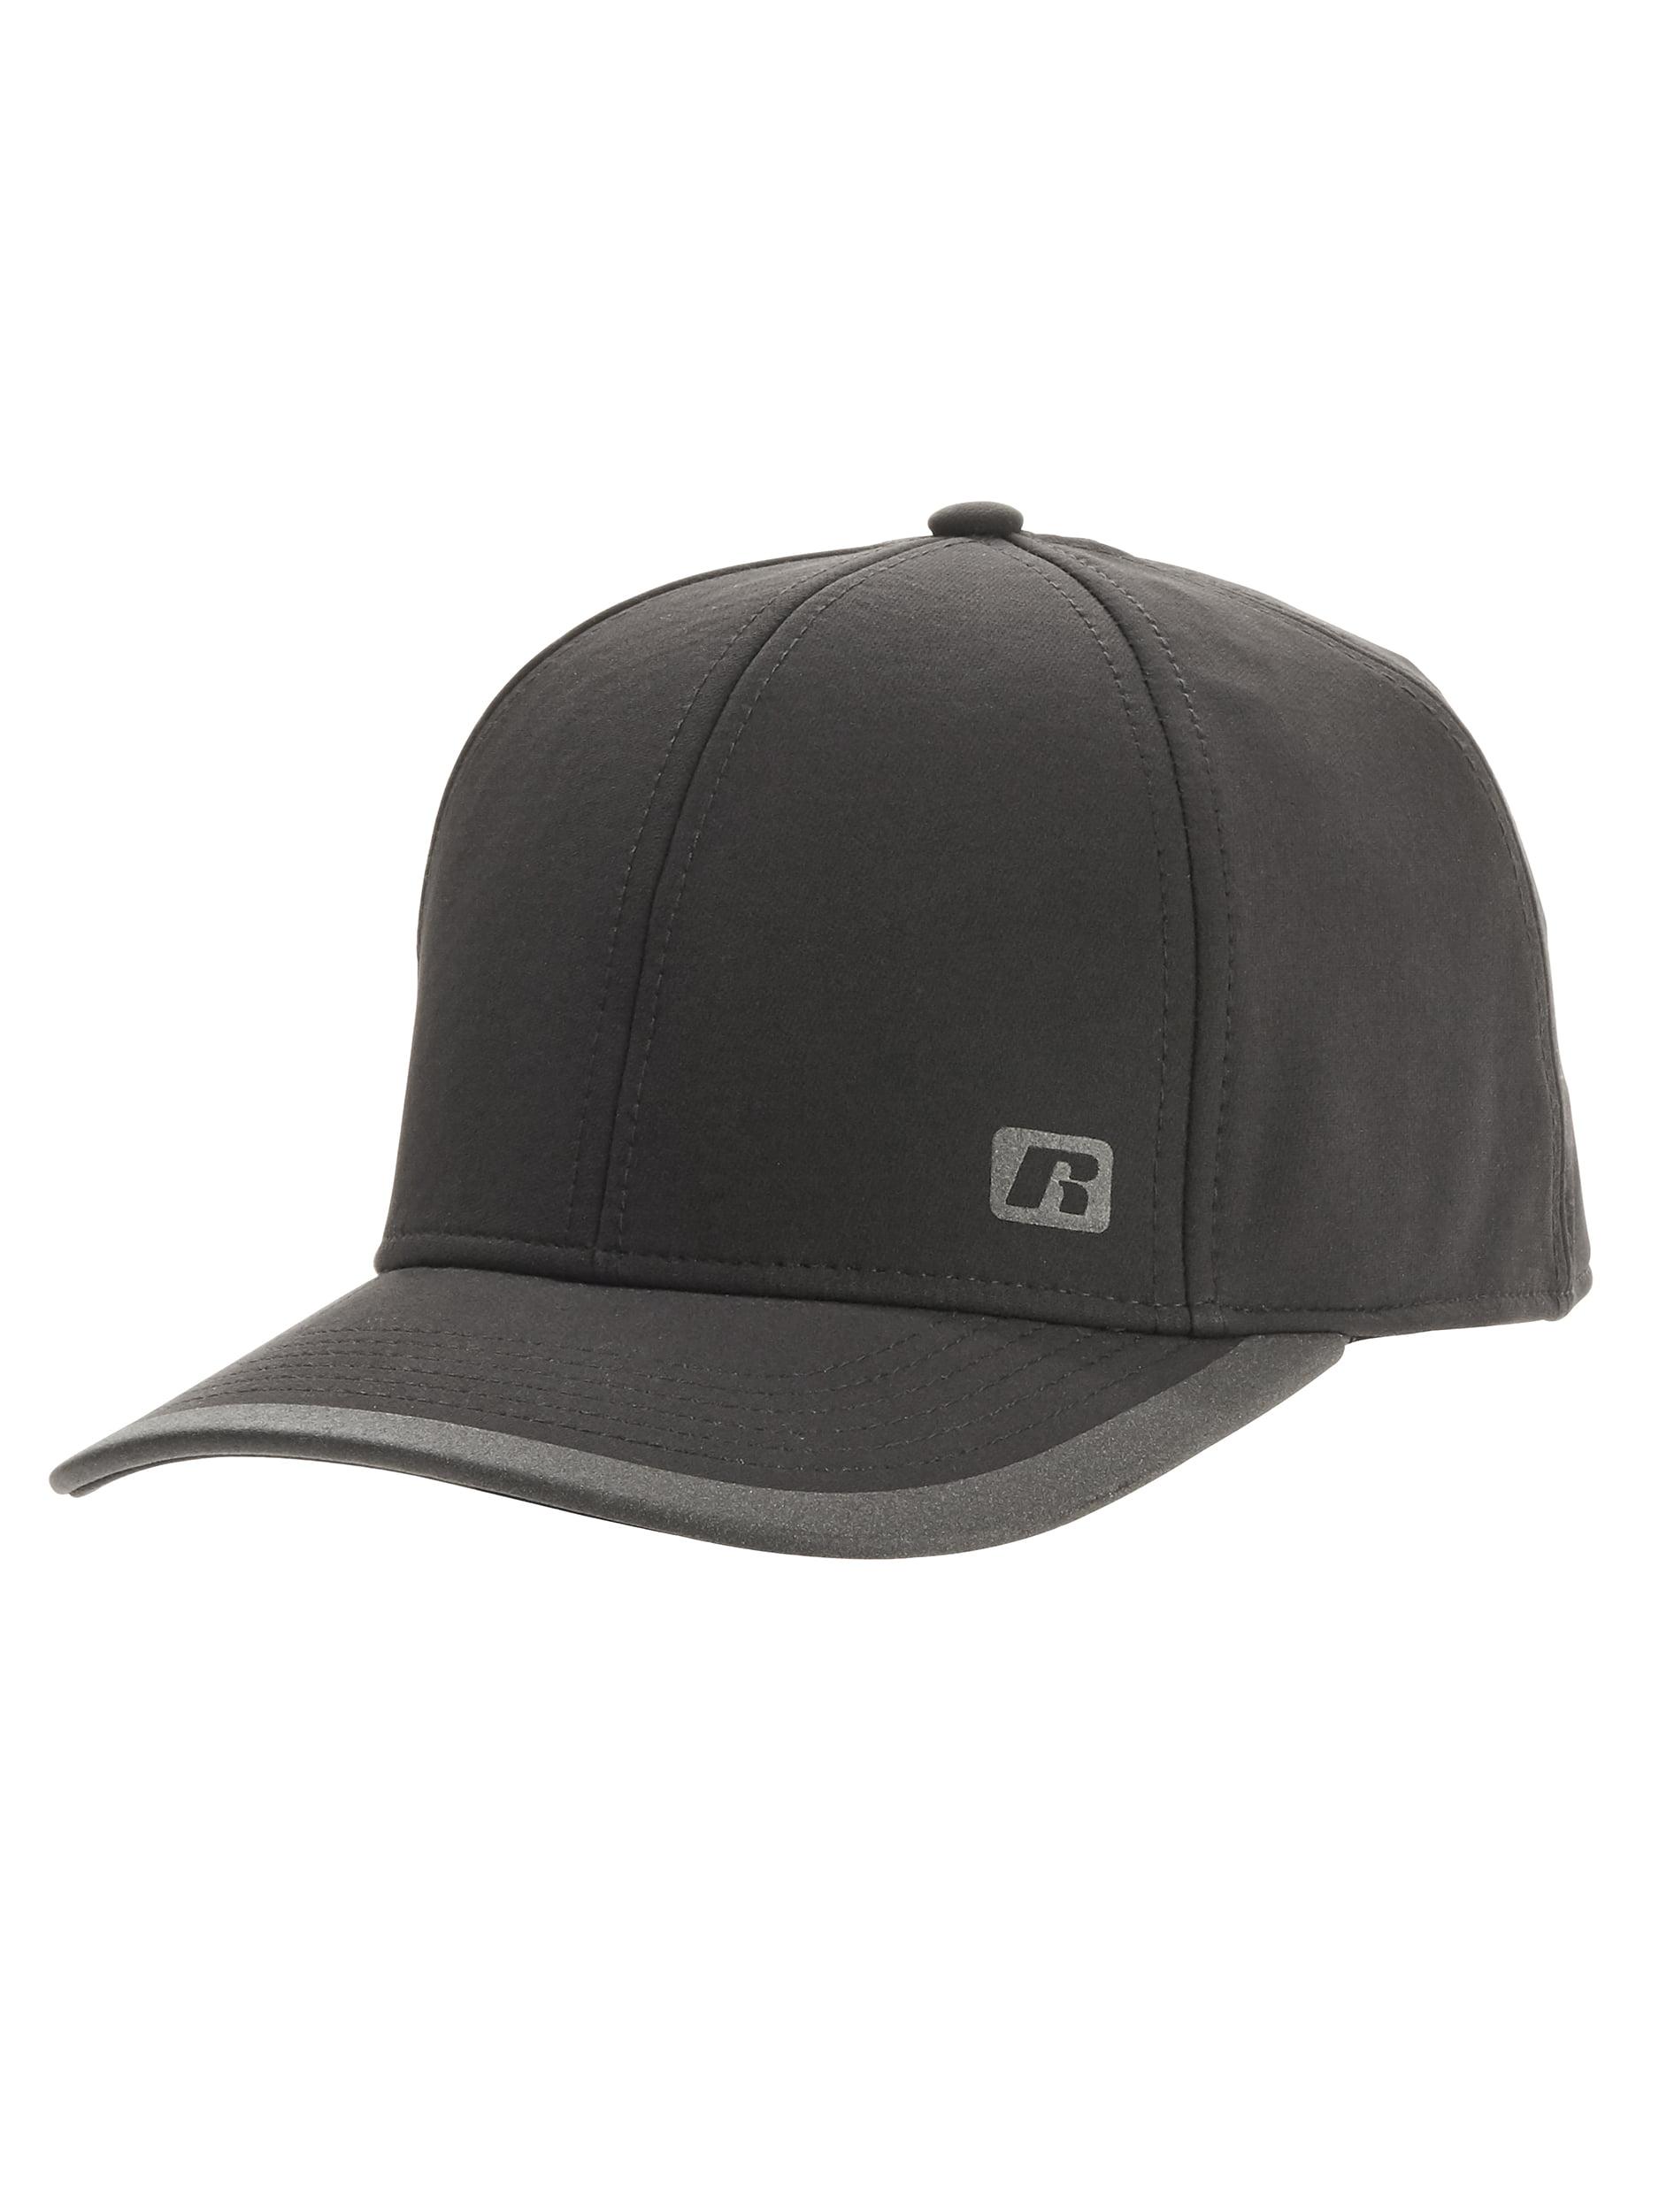 Where To Rus Mens Baseball Hat W Reflective Brim 58fc1 Cf541